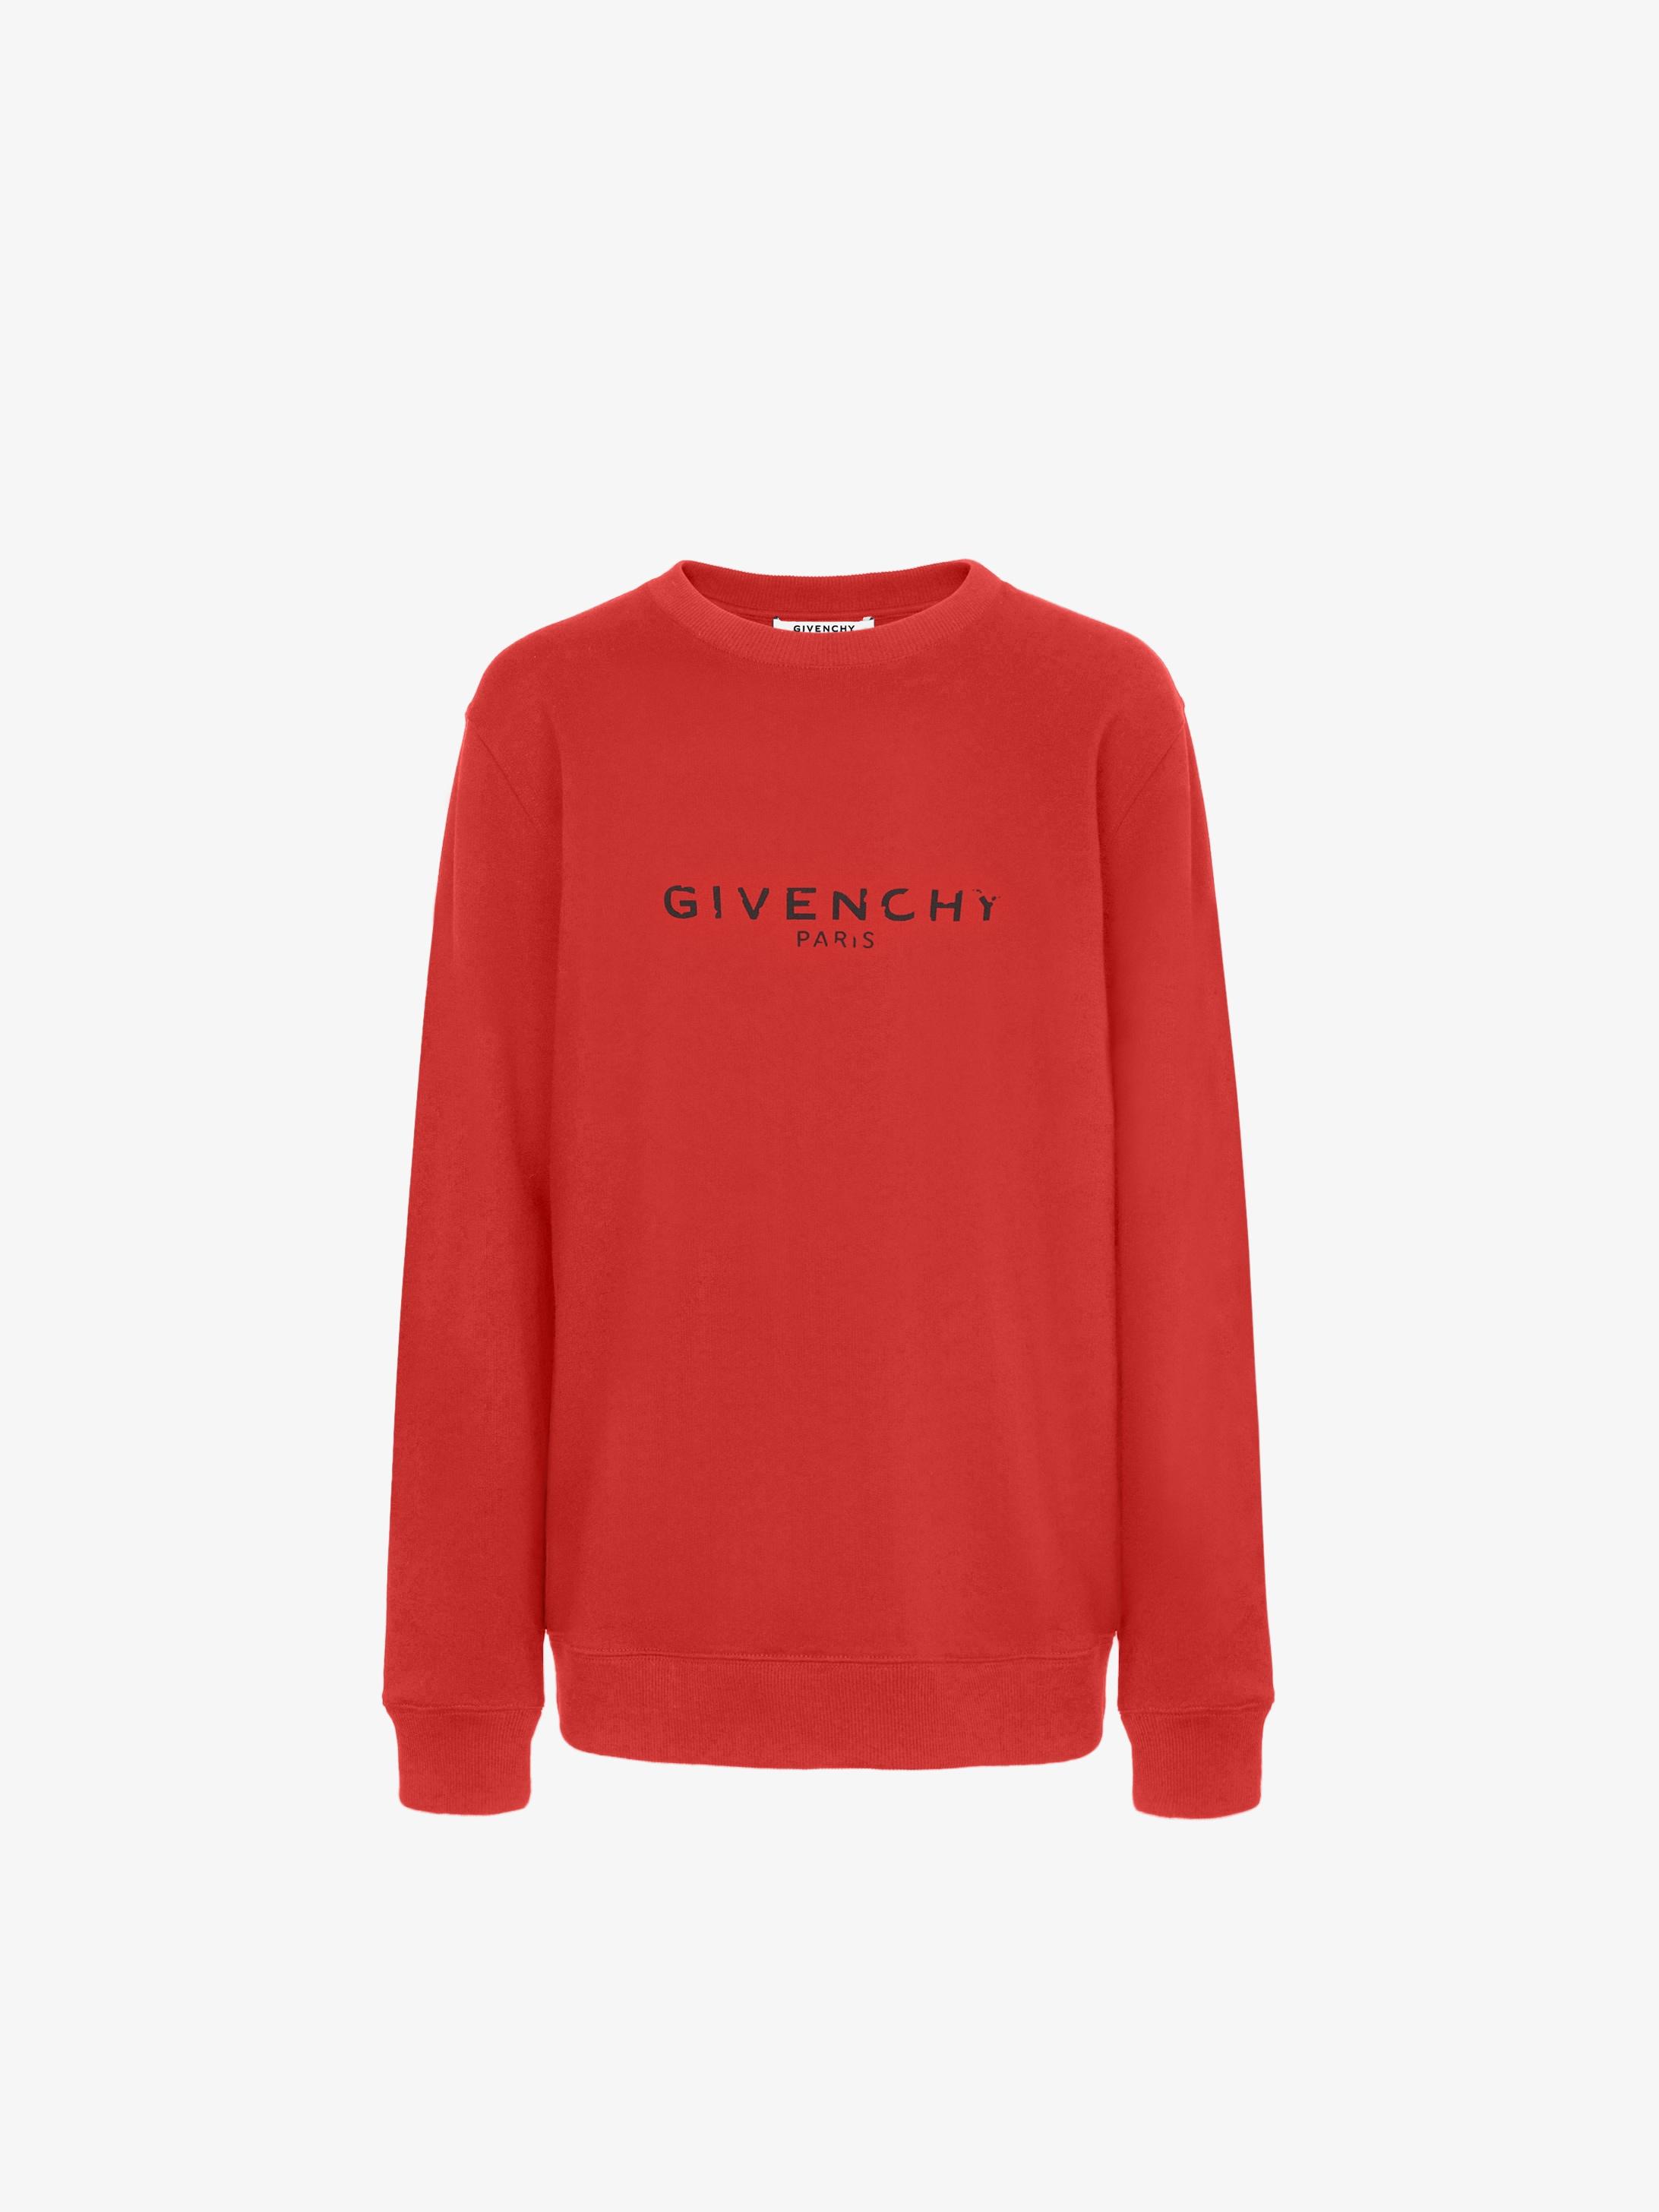 GIVENCHY PARIS sweatshirt